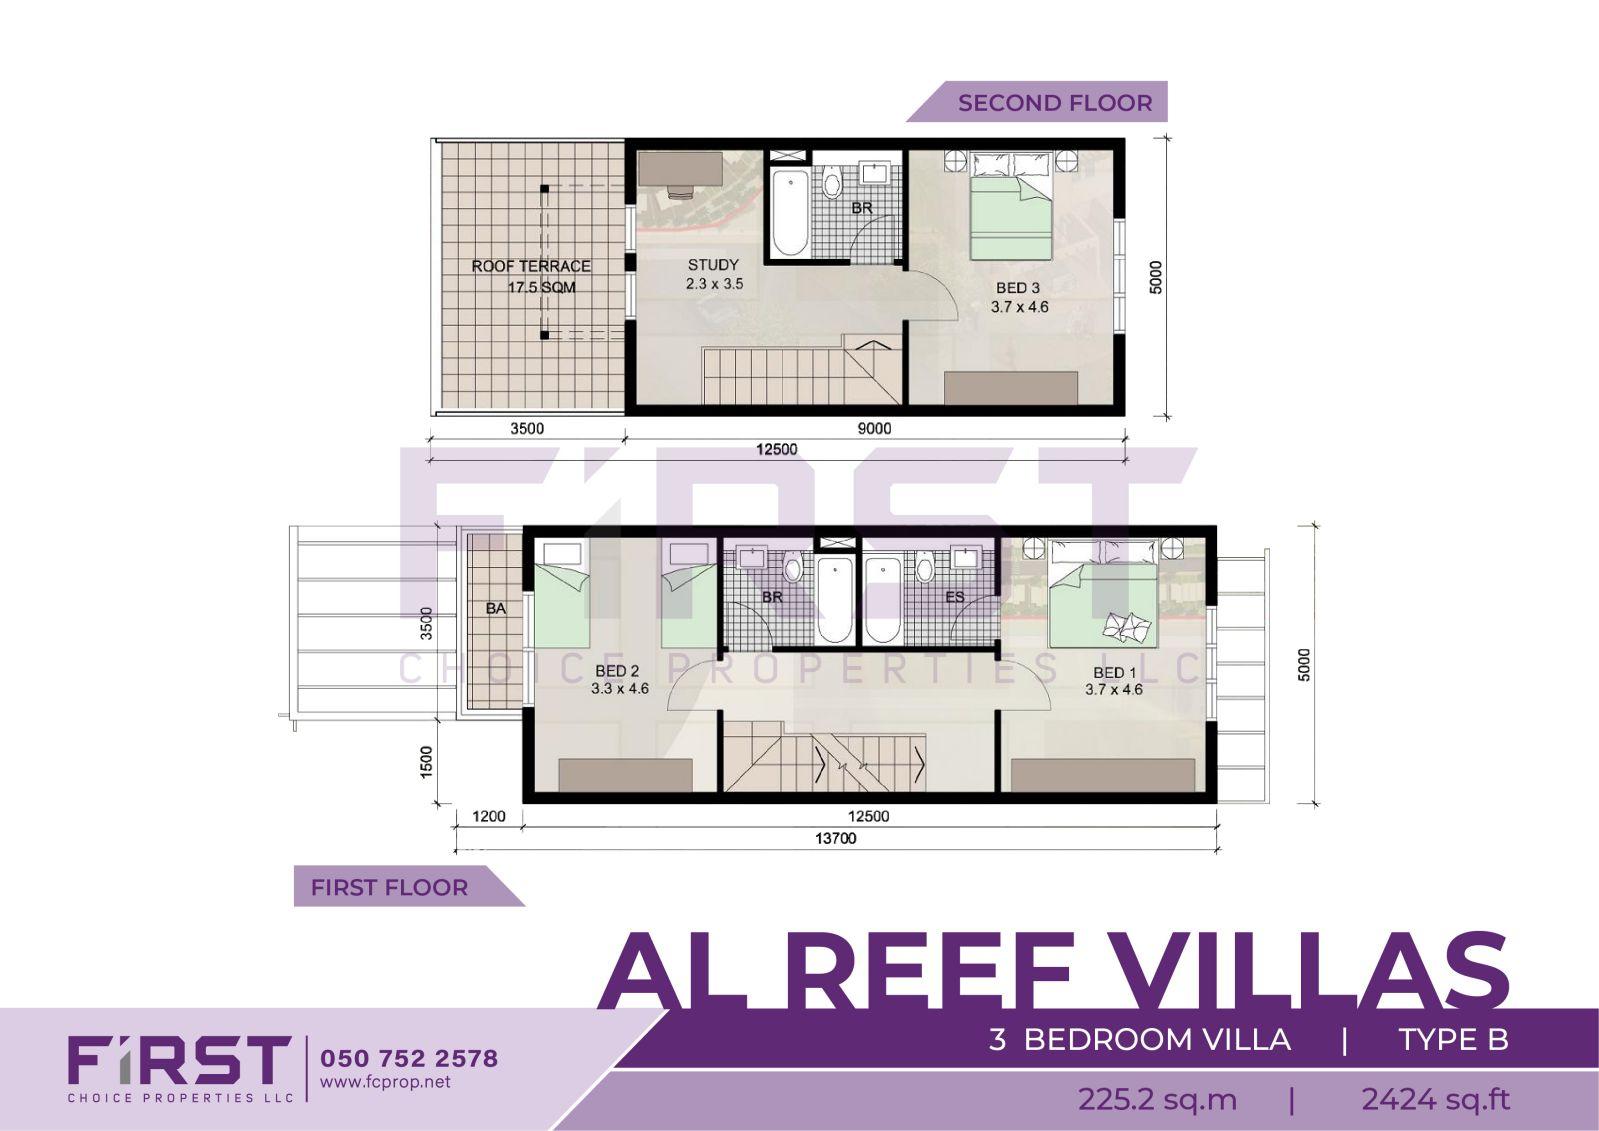 Al Reef Abu Dhabi Al Reef Villas 3 Bedroom Villa Type B 225.2 sq.m 2424 sq.ft 1.jpg